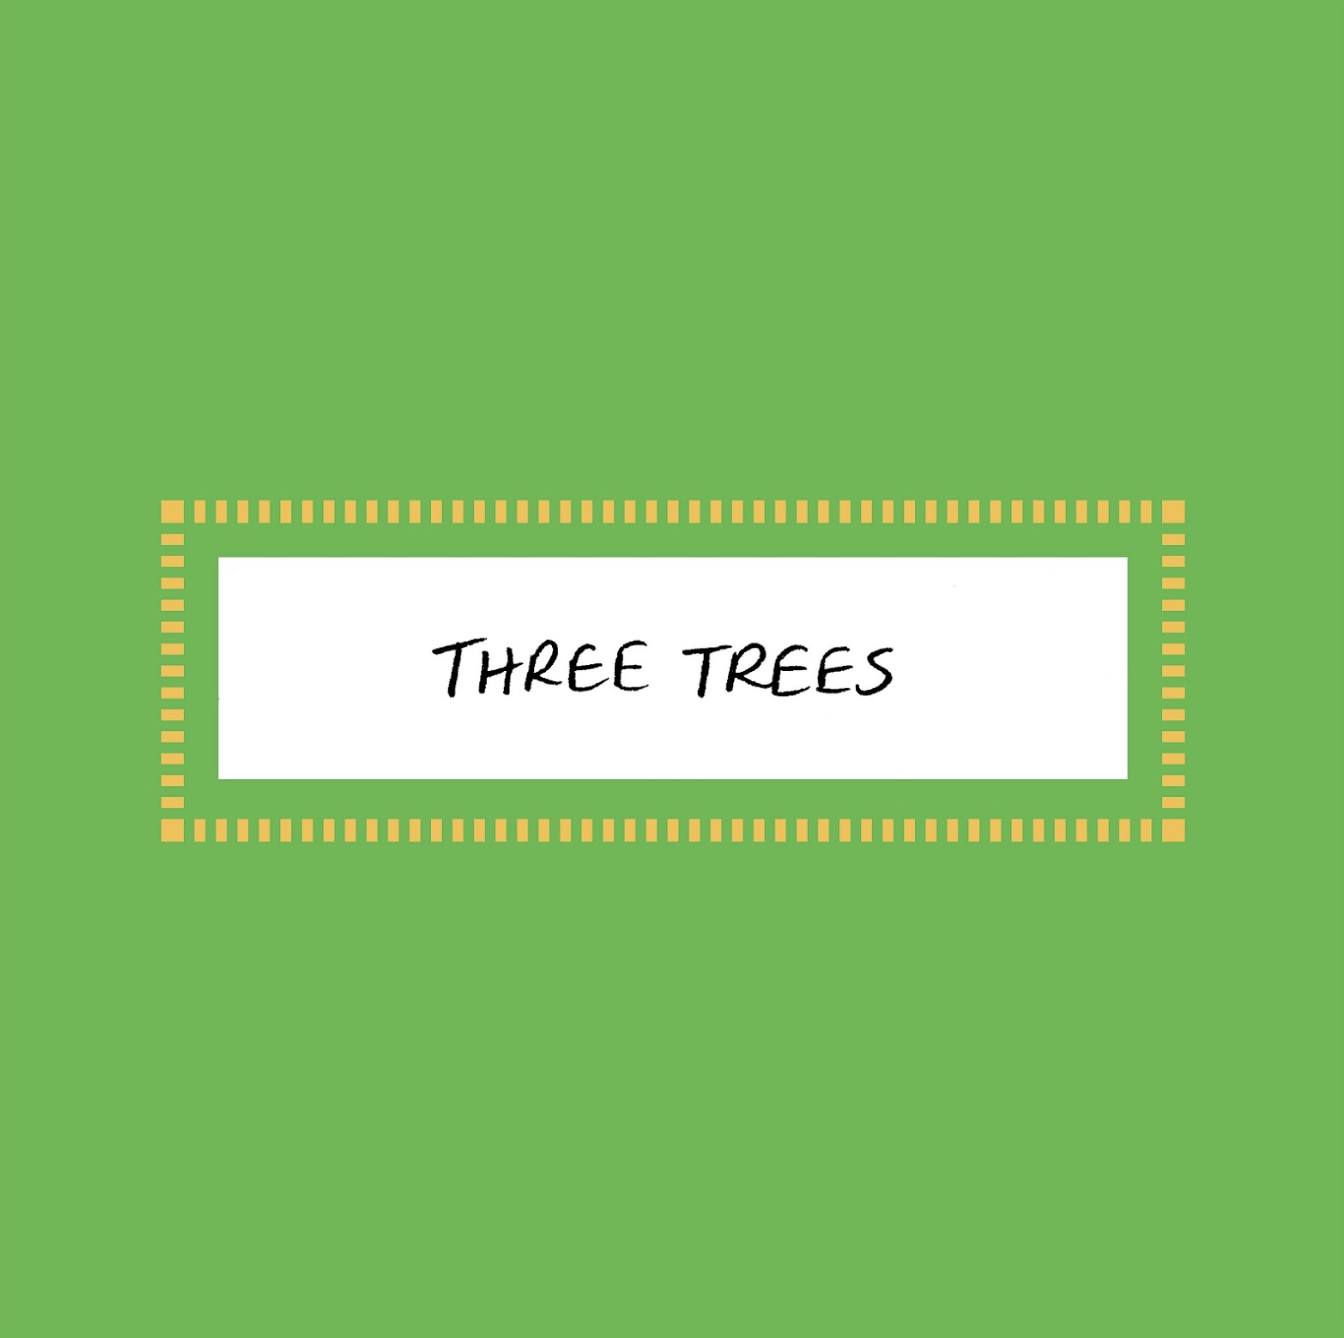 Three Trees  by Tiffany Troy